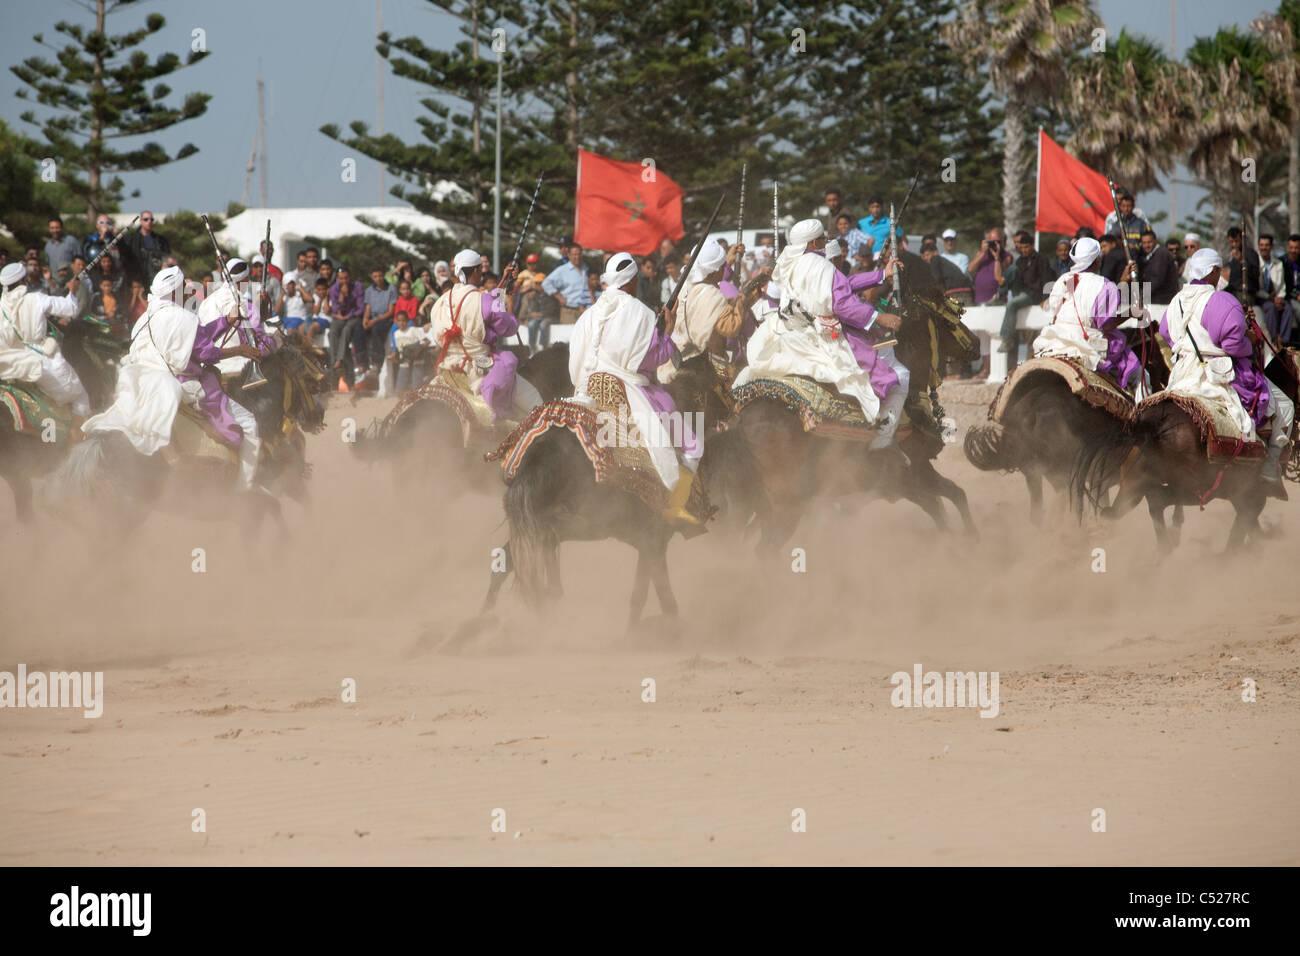 Fantasia on the beach in Essaouira during the music festival, The Gnaoua - Stock Image